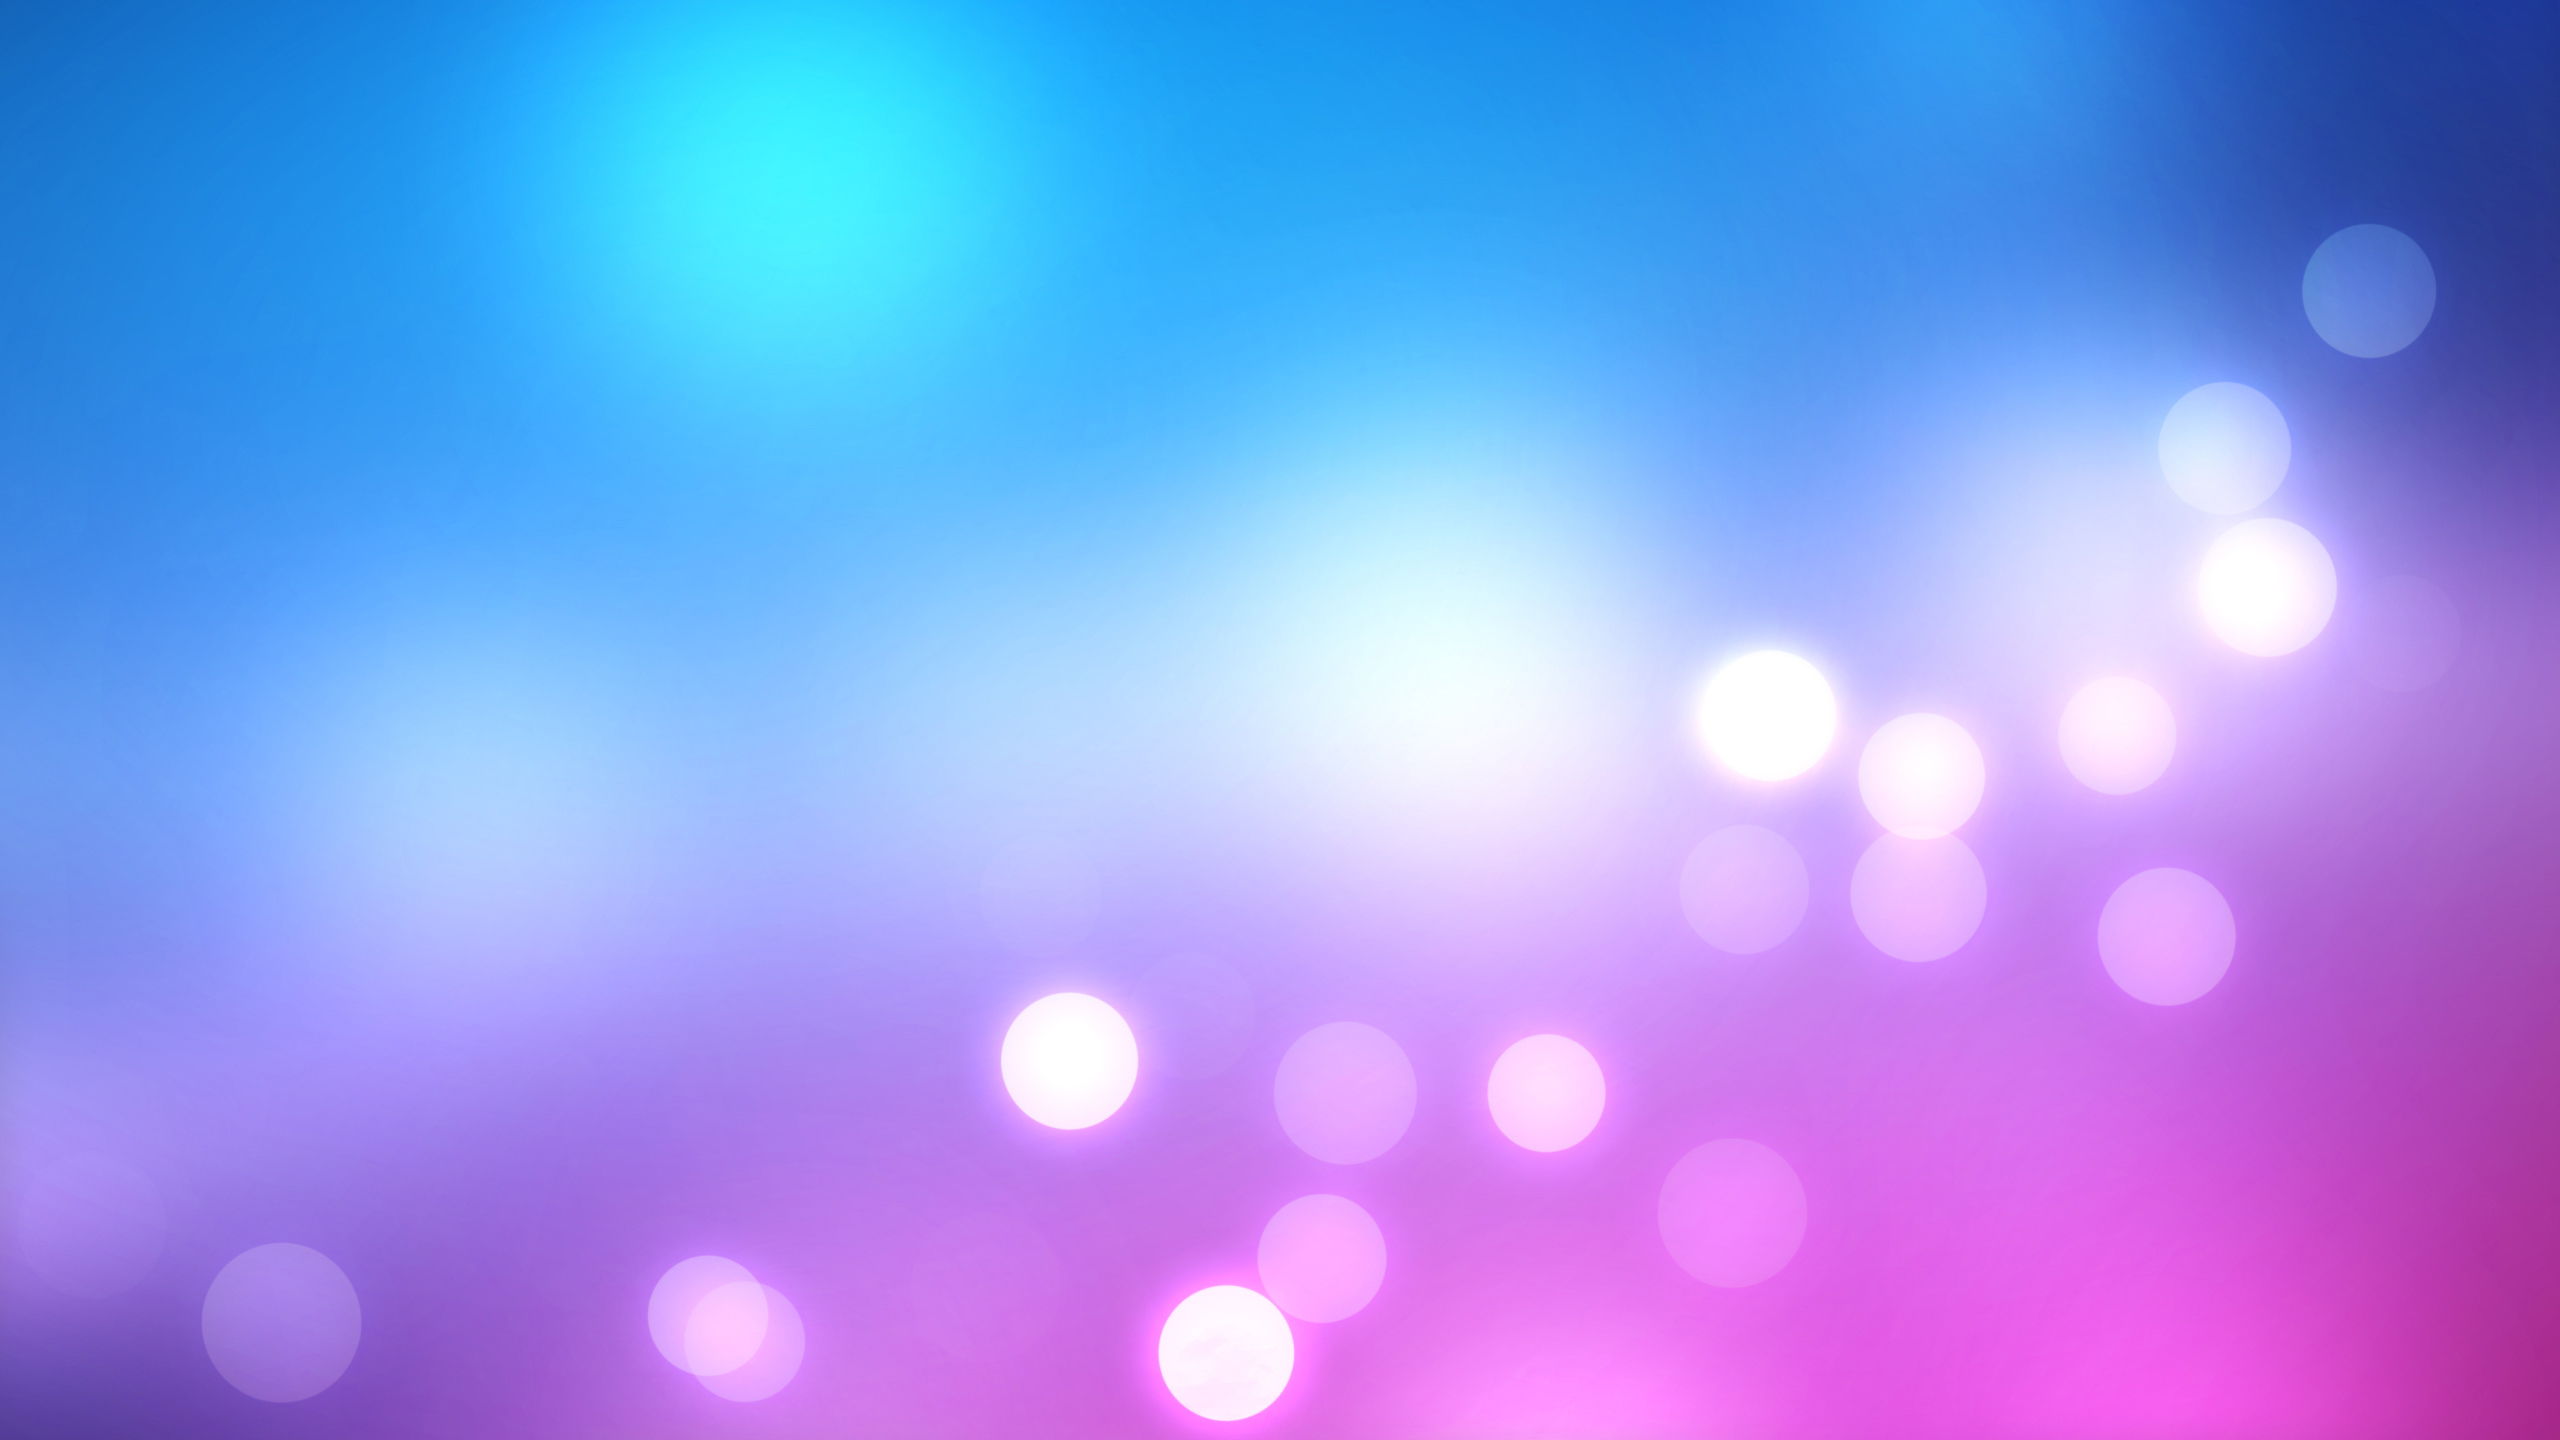 Pink Purple and Blue Wallpapers - WallpaperSafari